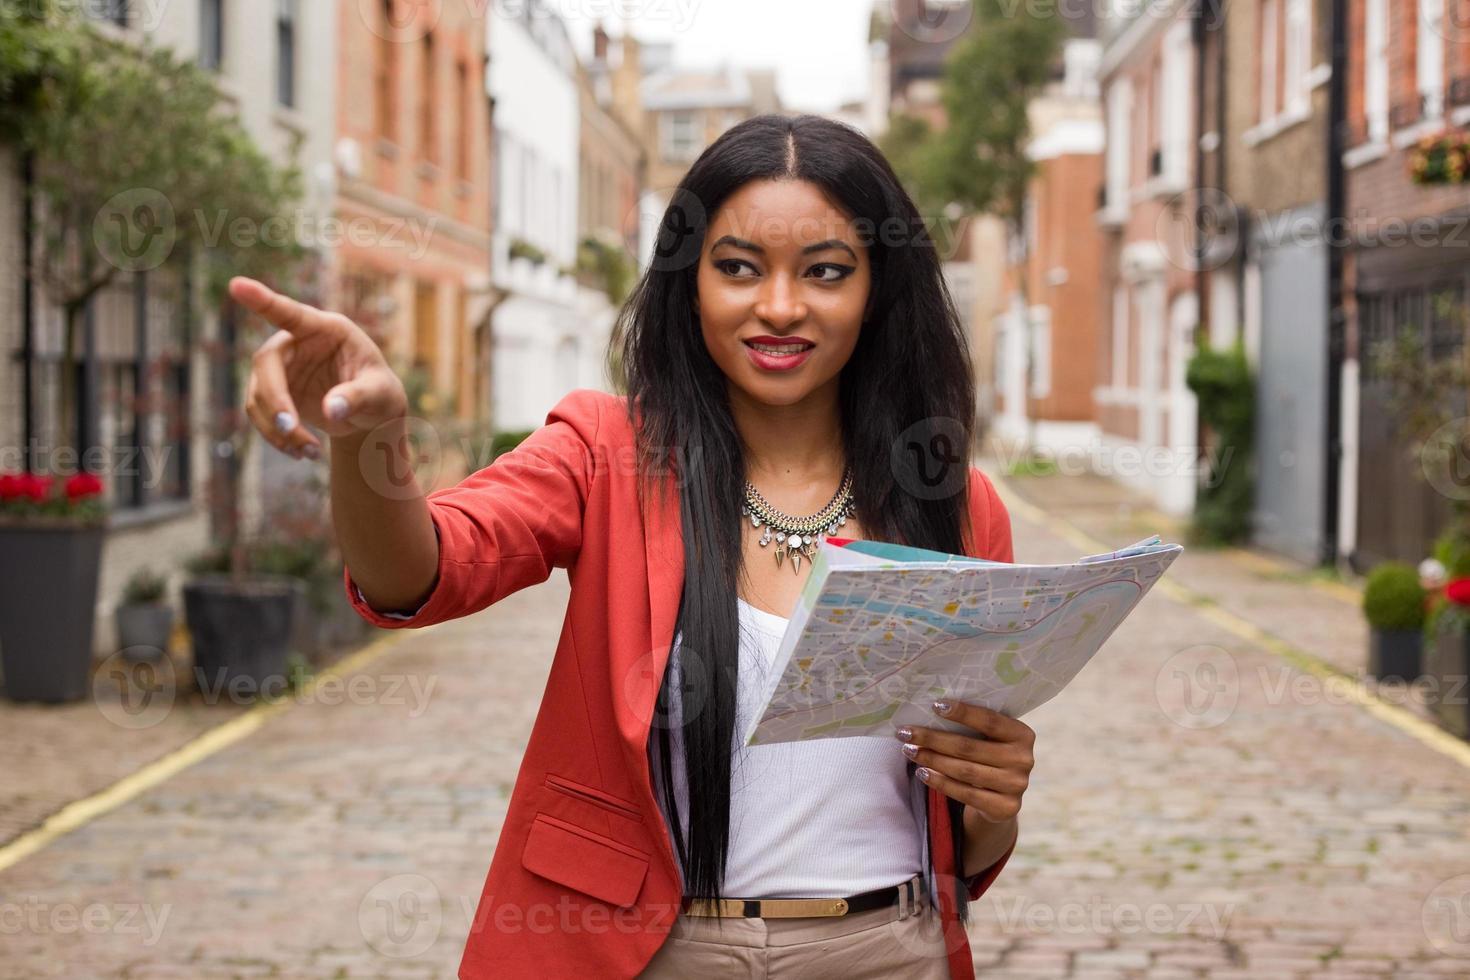 turista segurando um mapa foto